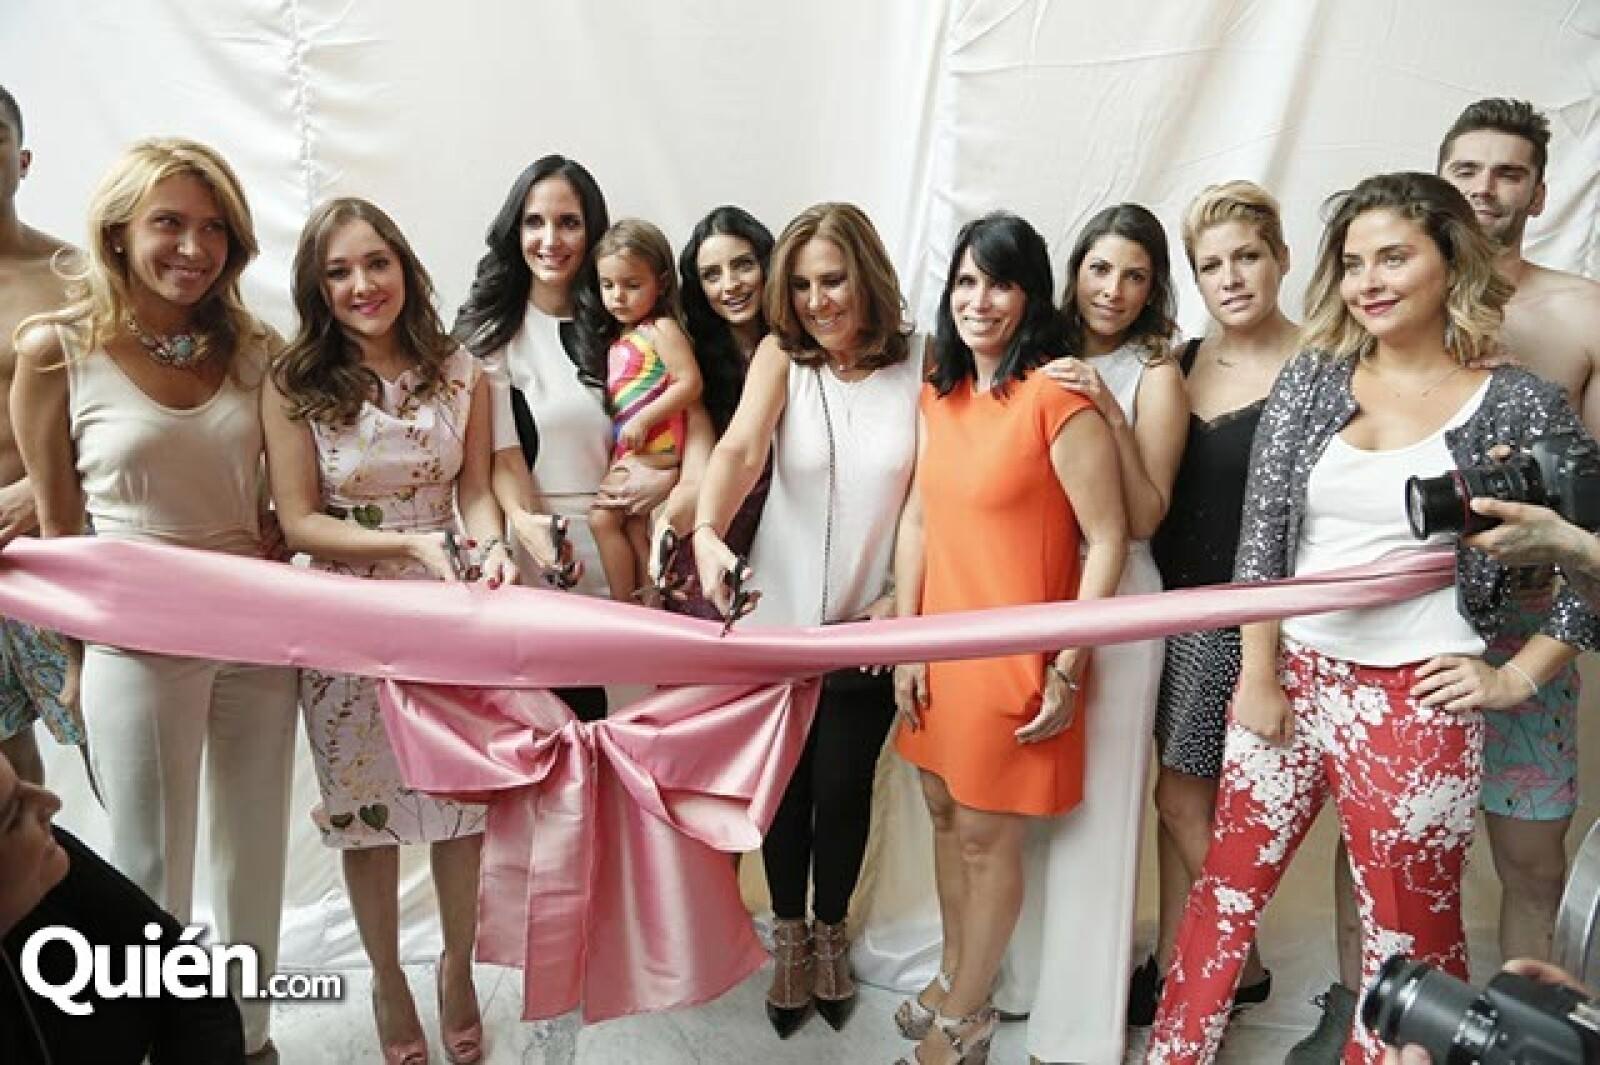 Jimena Gallego,Sherlyn,Valeria López,Natalia López,Aislinn Derbez,Pily Quiroga,Claudia Reta,Sylvana Beltrones,Paulina Díaz Ordaz y Alexia Camil